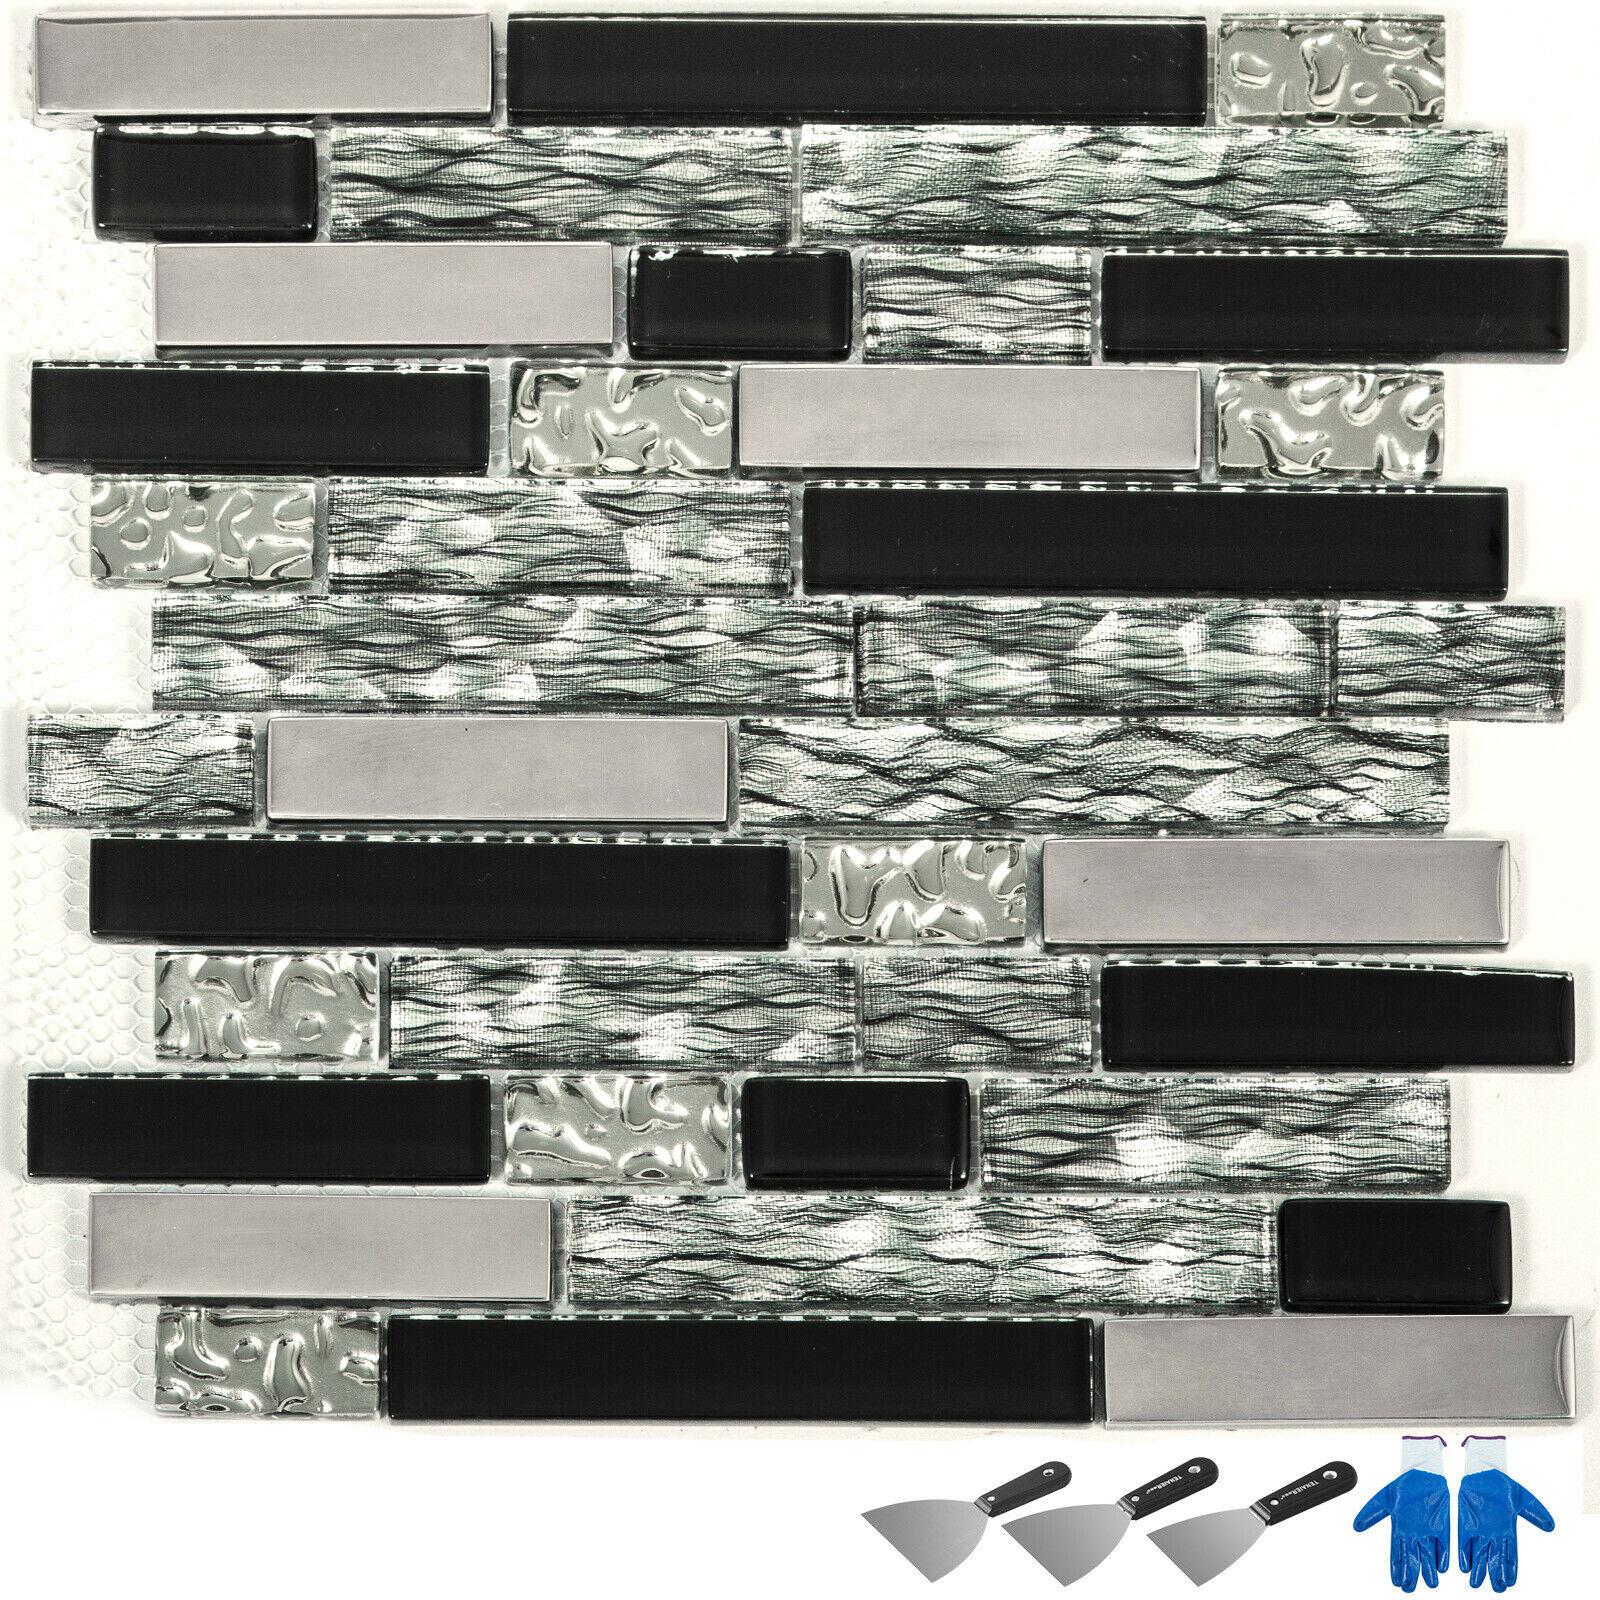 6 Sq Feet Black Silver Glass Tile Kitchen Backsplash Mosaic Art Decor Bath Wall